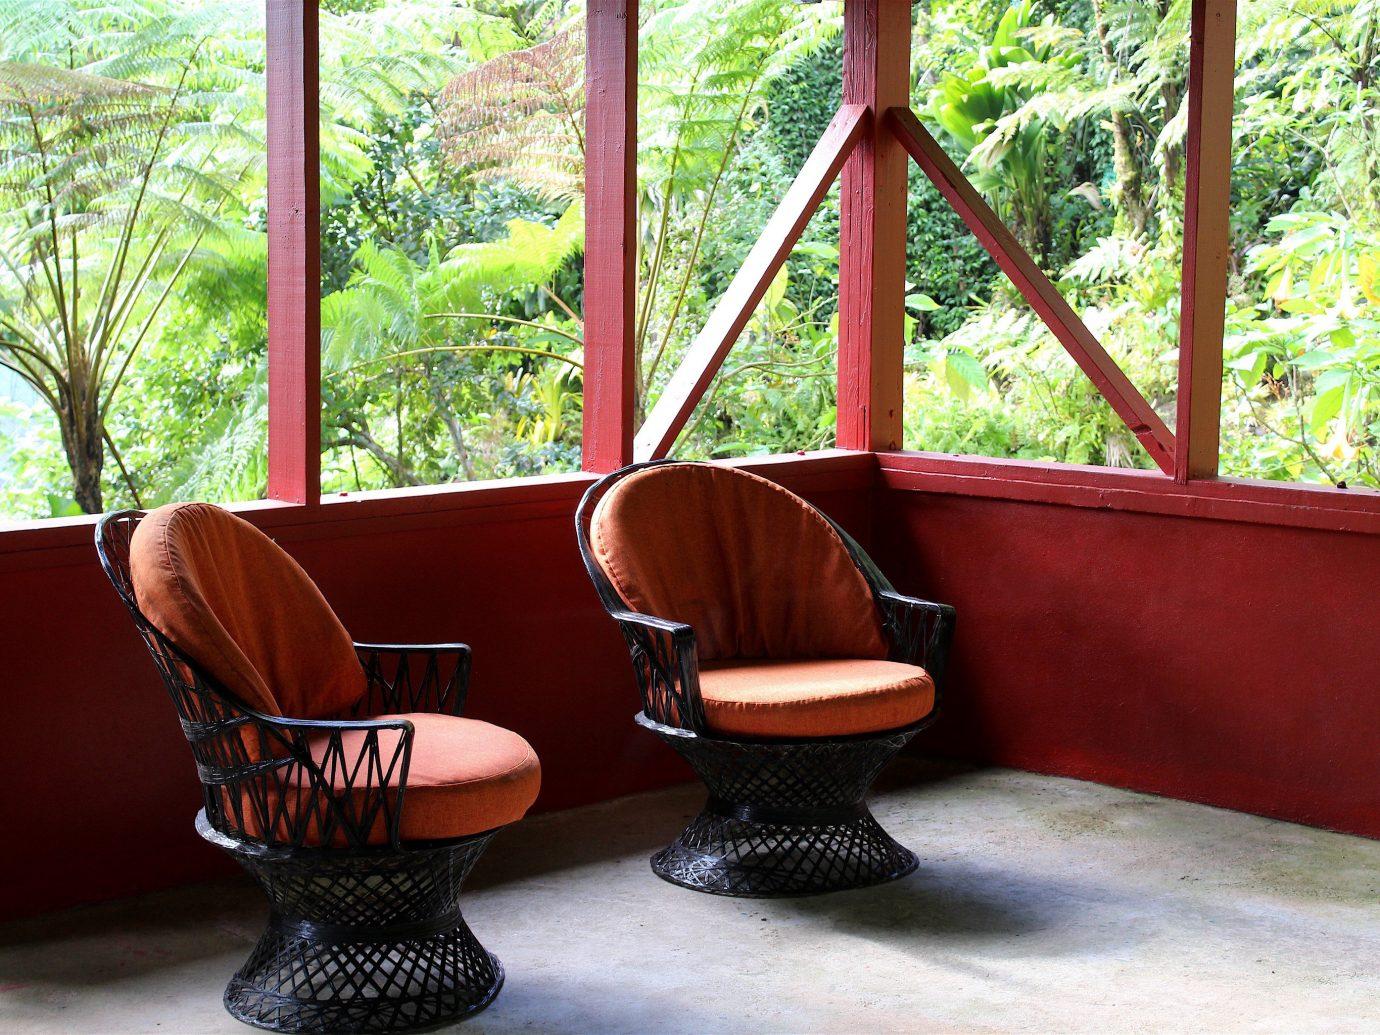 Trip Ideas window indoor tree floor chair room furniture property red home living room table interior design Design seat